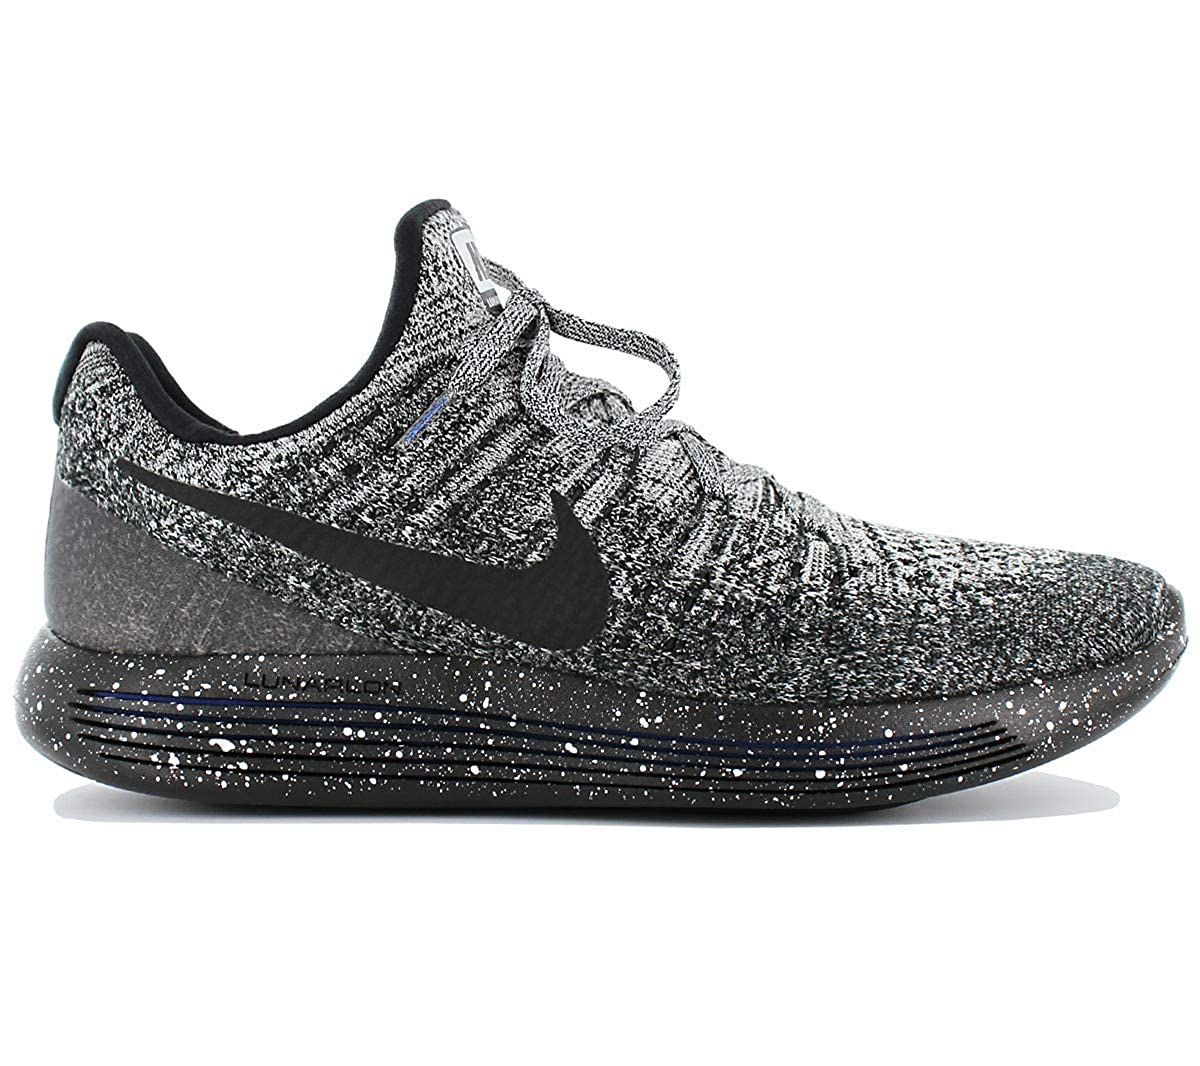 Pantalones Característica jueves  Buy Nike Men's Lunarepic Low Flyknit 2 Running Shoe Black/Black-White-Racer  Blue 11. 0 at Amazon.in